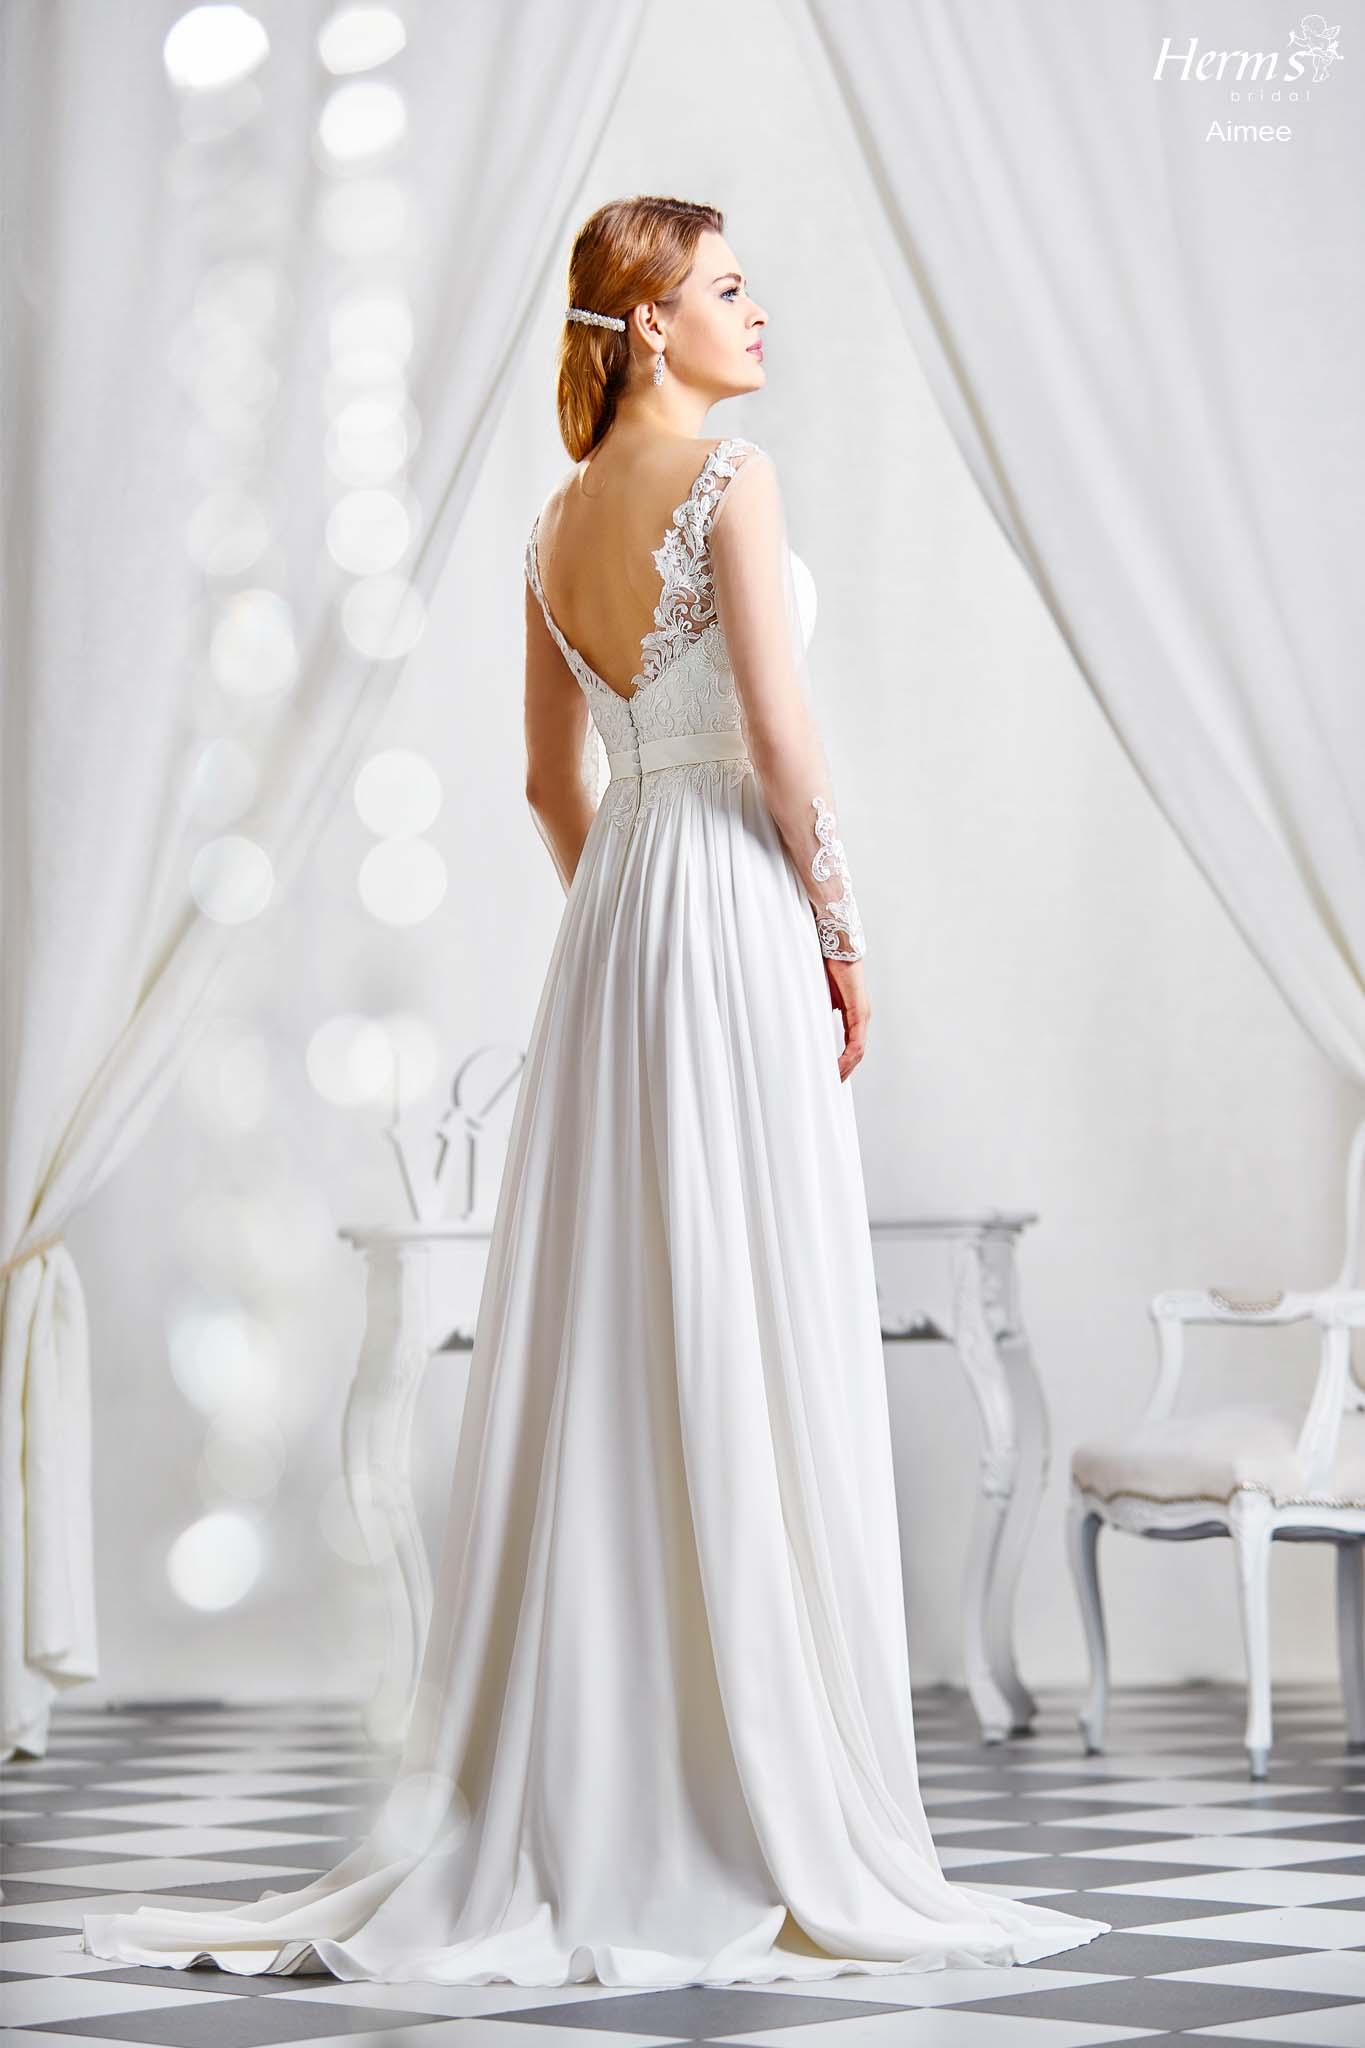 wedding dress Herm's Bridal Aimee